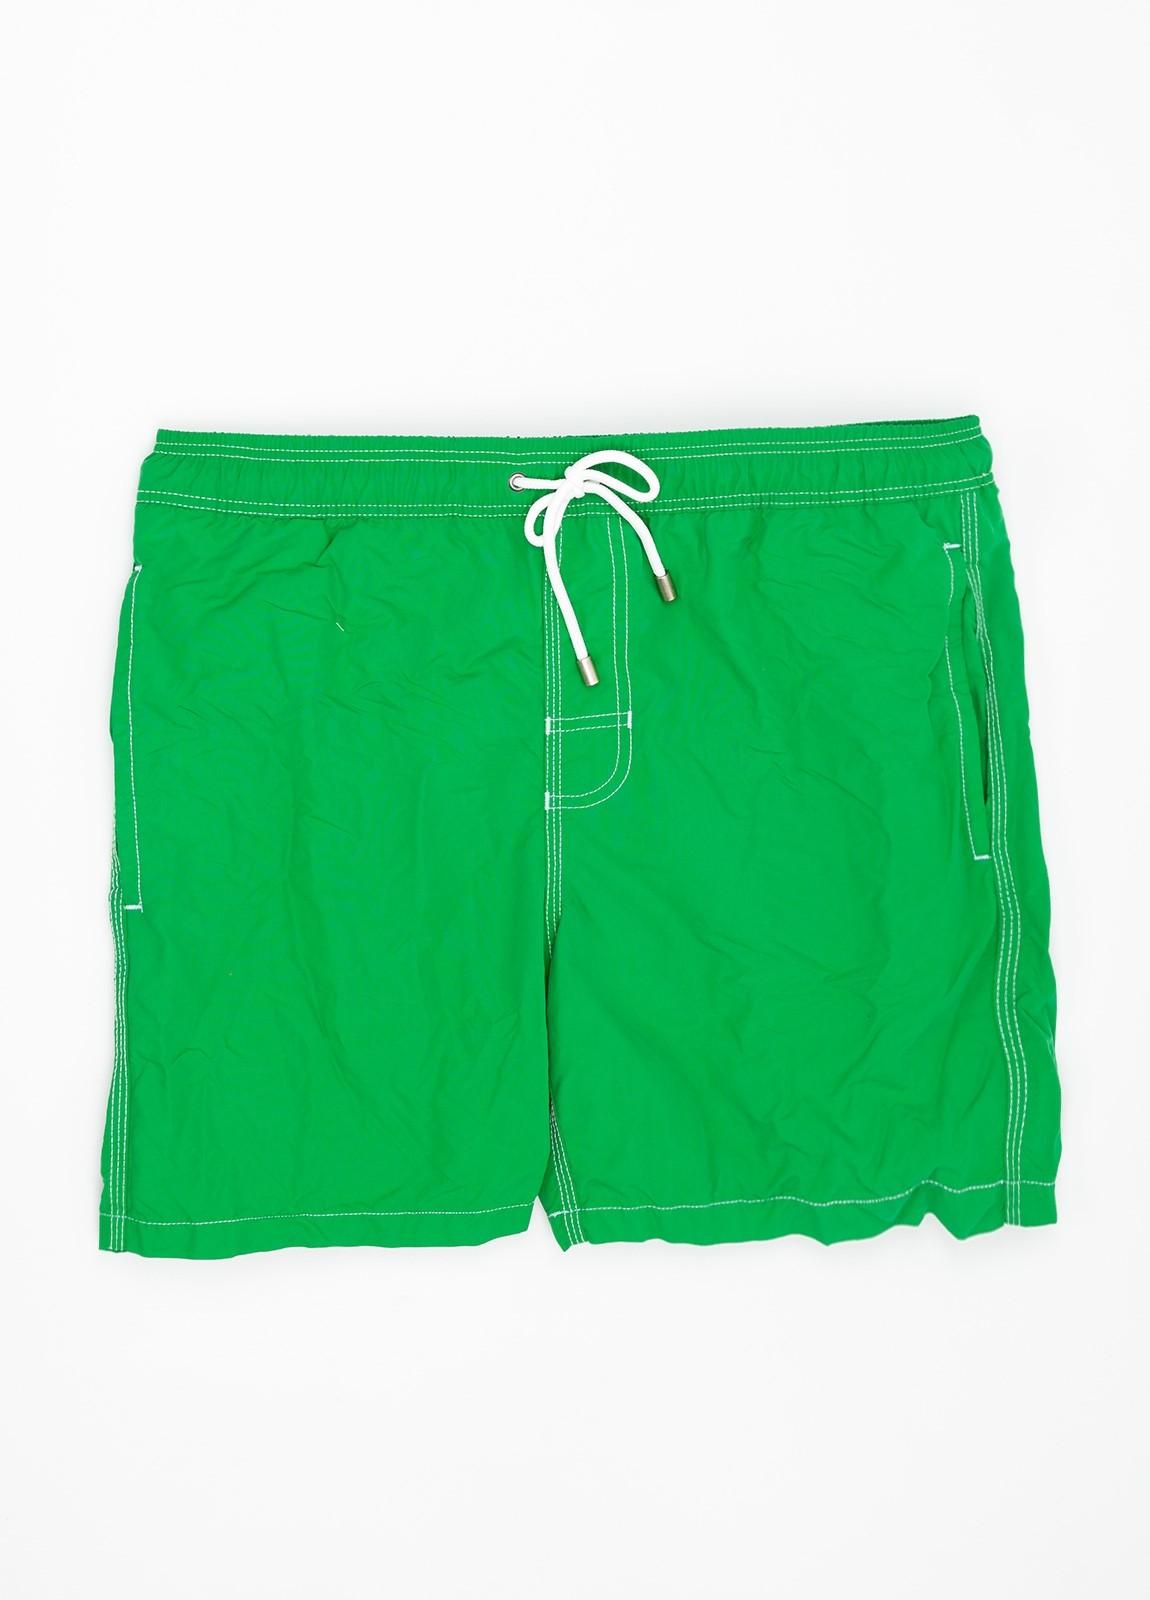 Bañador liso color verde.